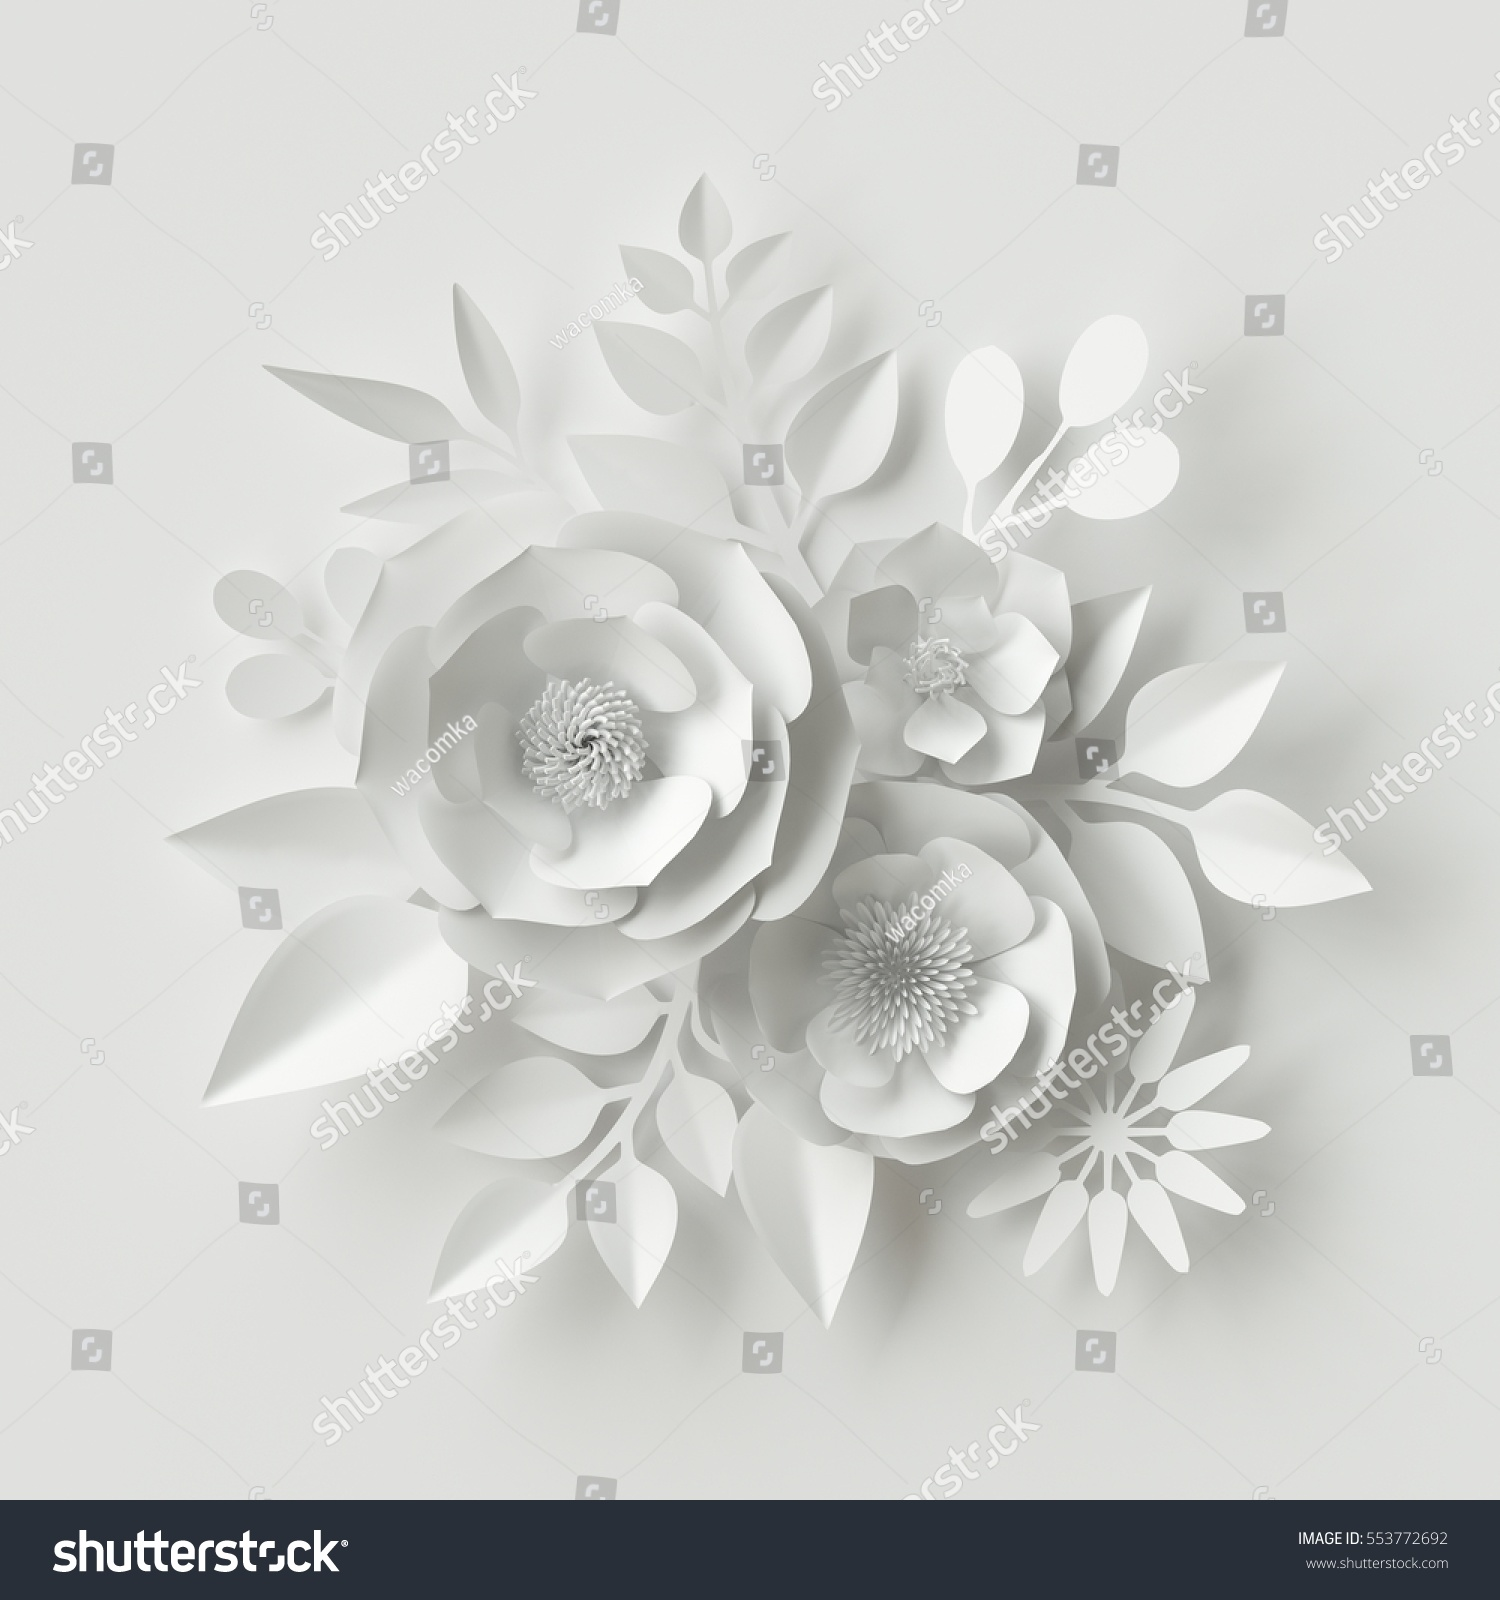 3d Render Digital Illustration White Paper Flowers Background